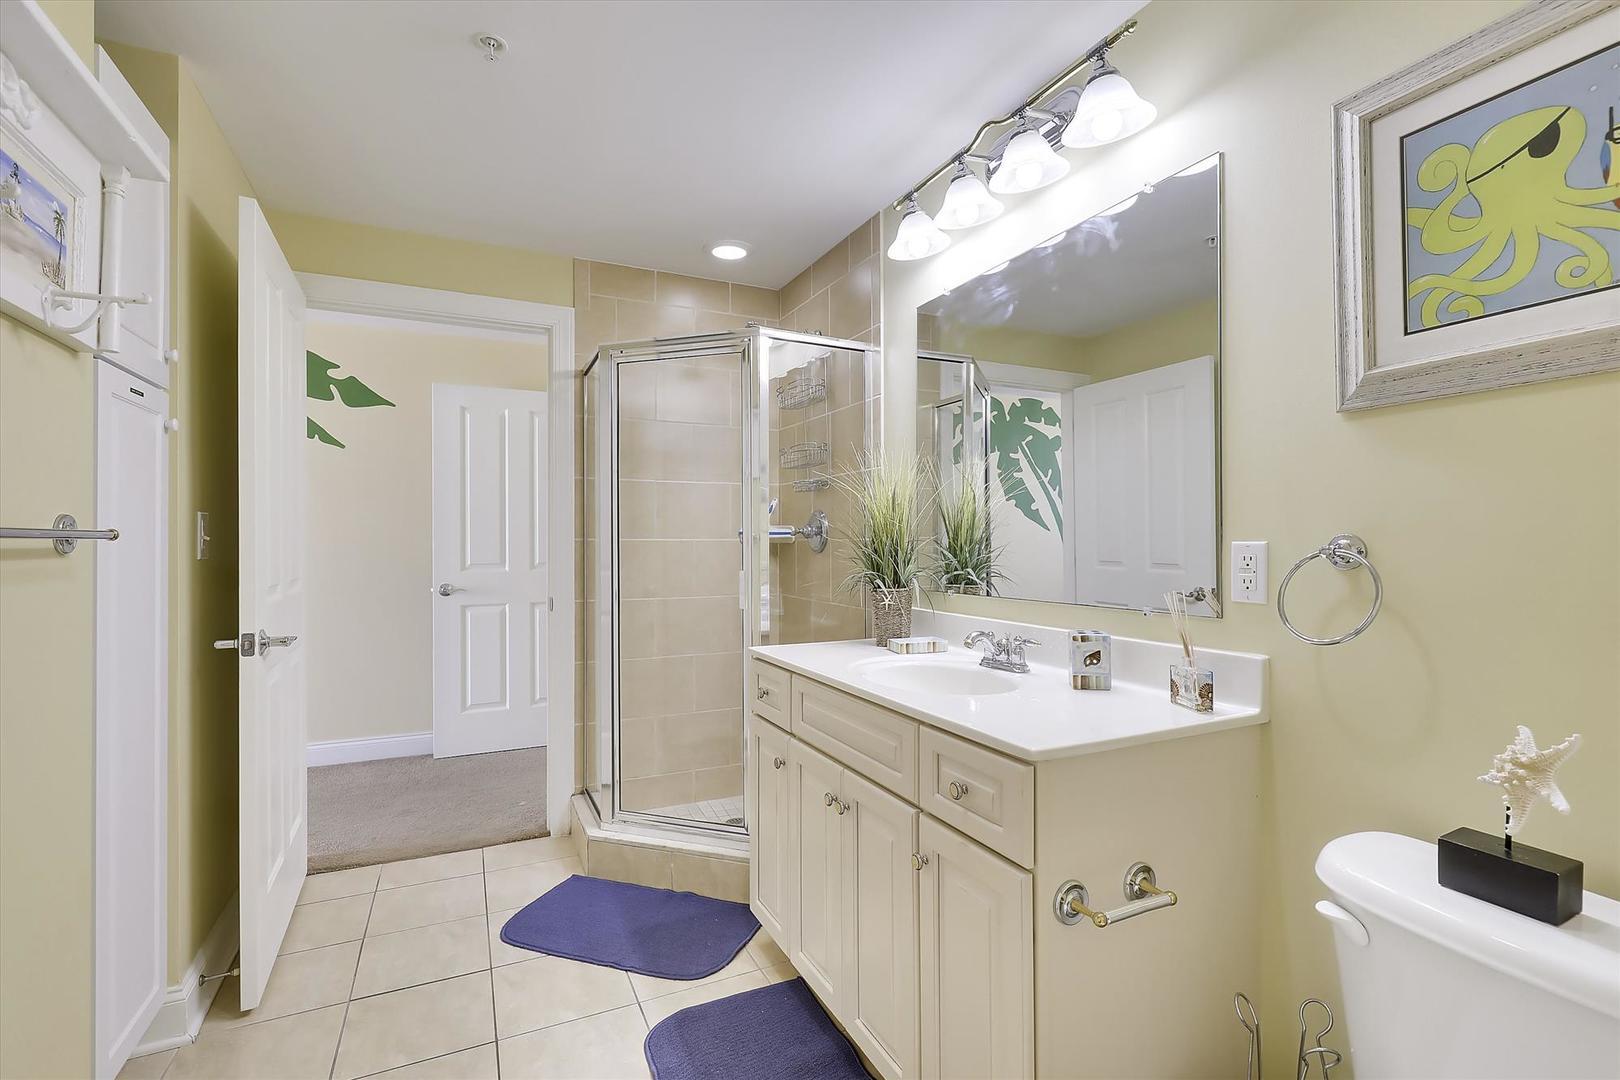 Belmont Towers 511 - Bathroom 2